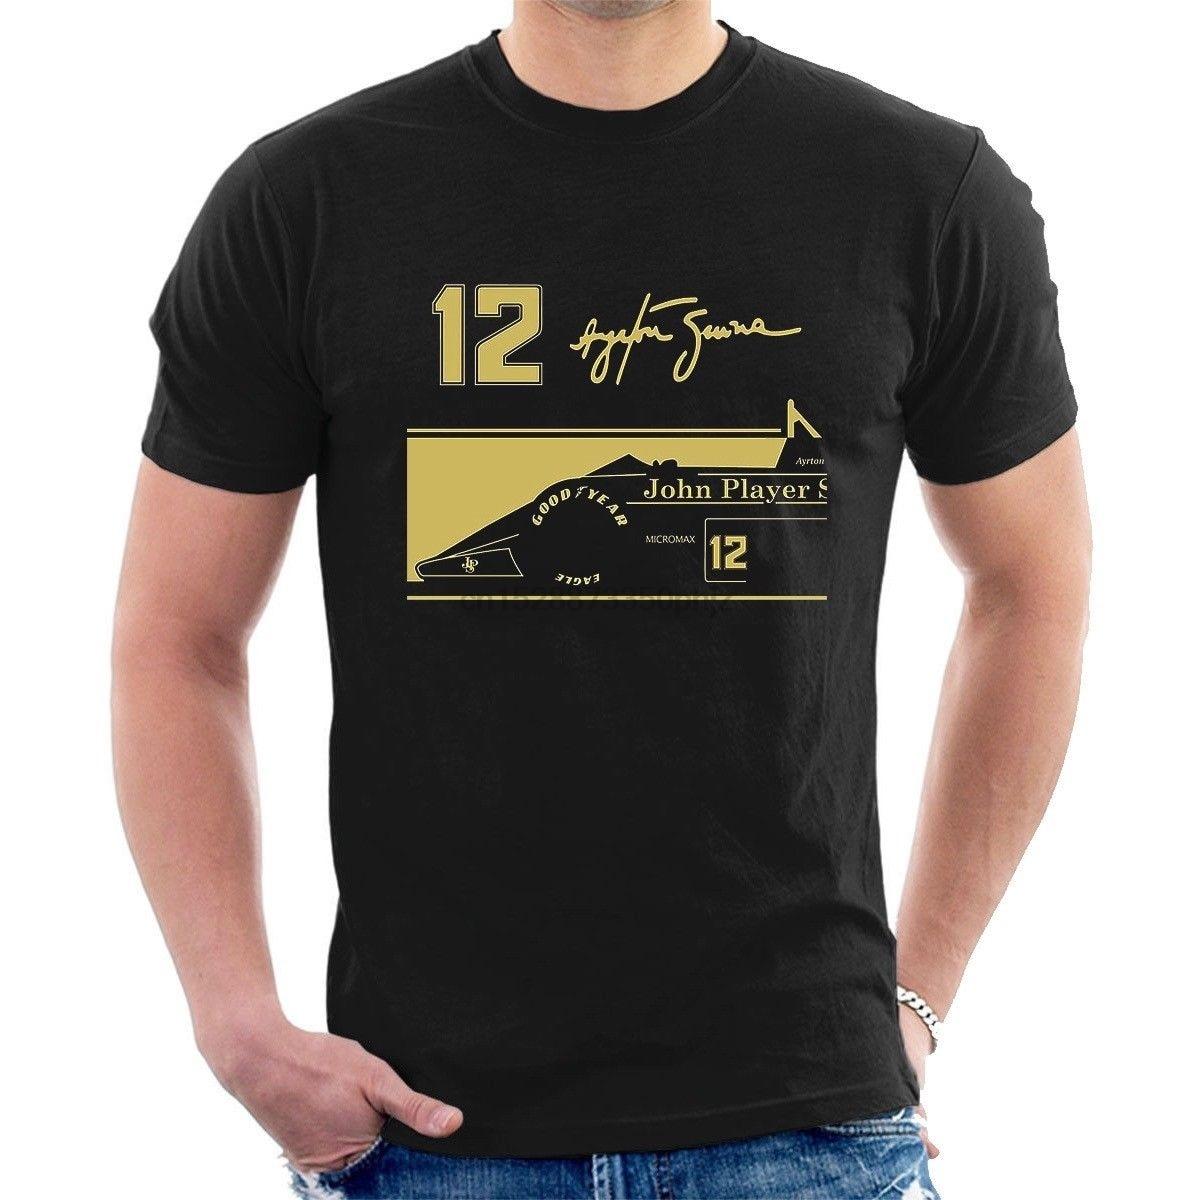 2019-new-novelty-fashion-men-t-shirt-top-tee-casual-tops-ayrton-font-b-senna-b-font-jps-tribute-t-shirt-12-signature-bulk-t-shirts-o-neck